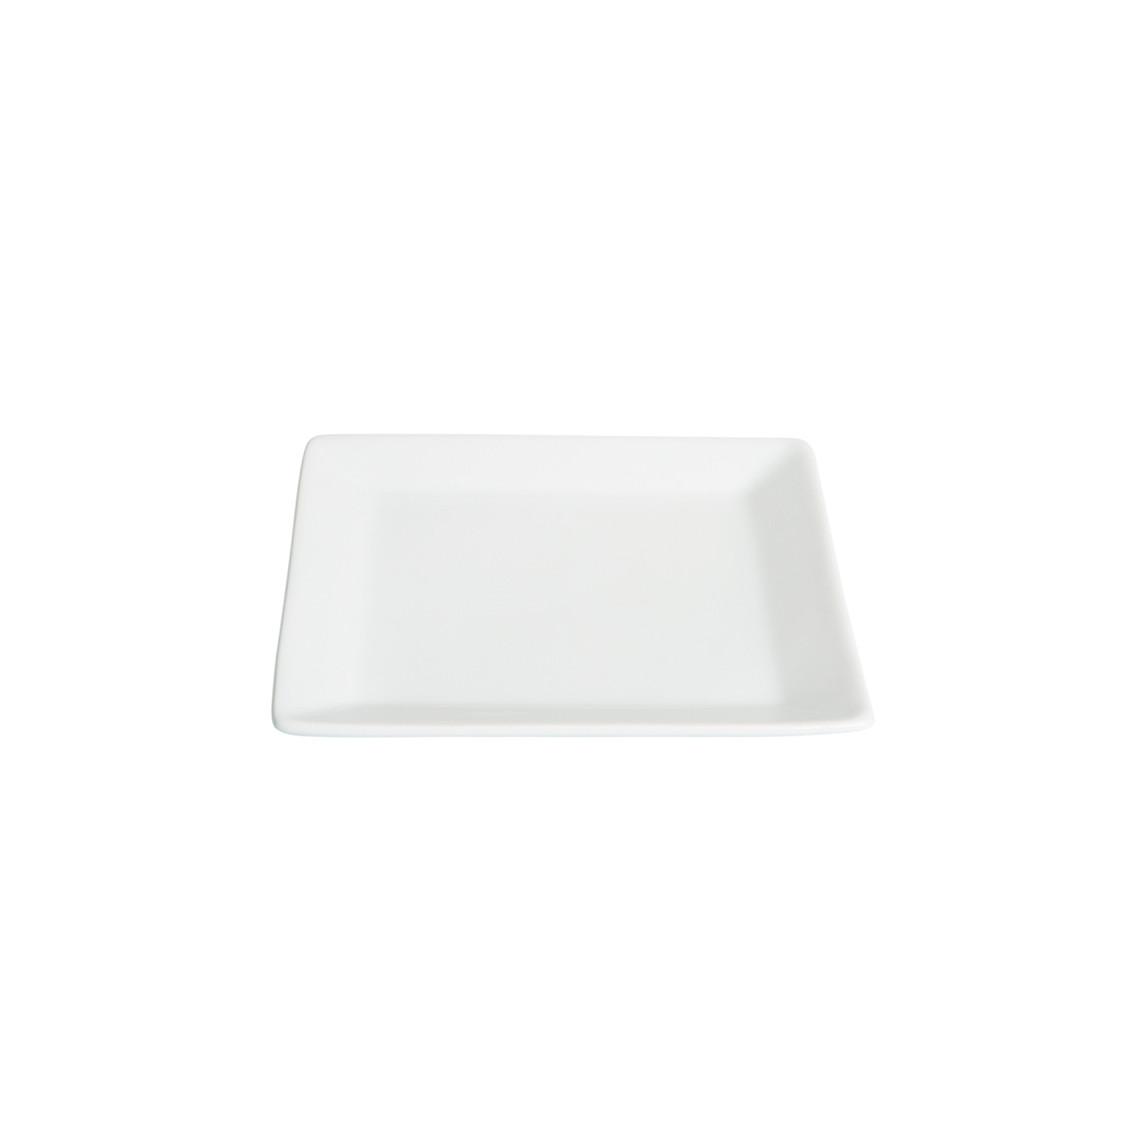 Assiette cocktail Tokyo blanche (15 x 15 cm)